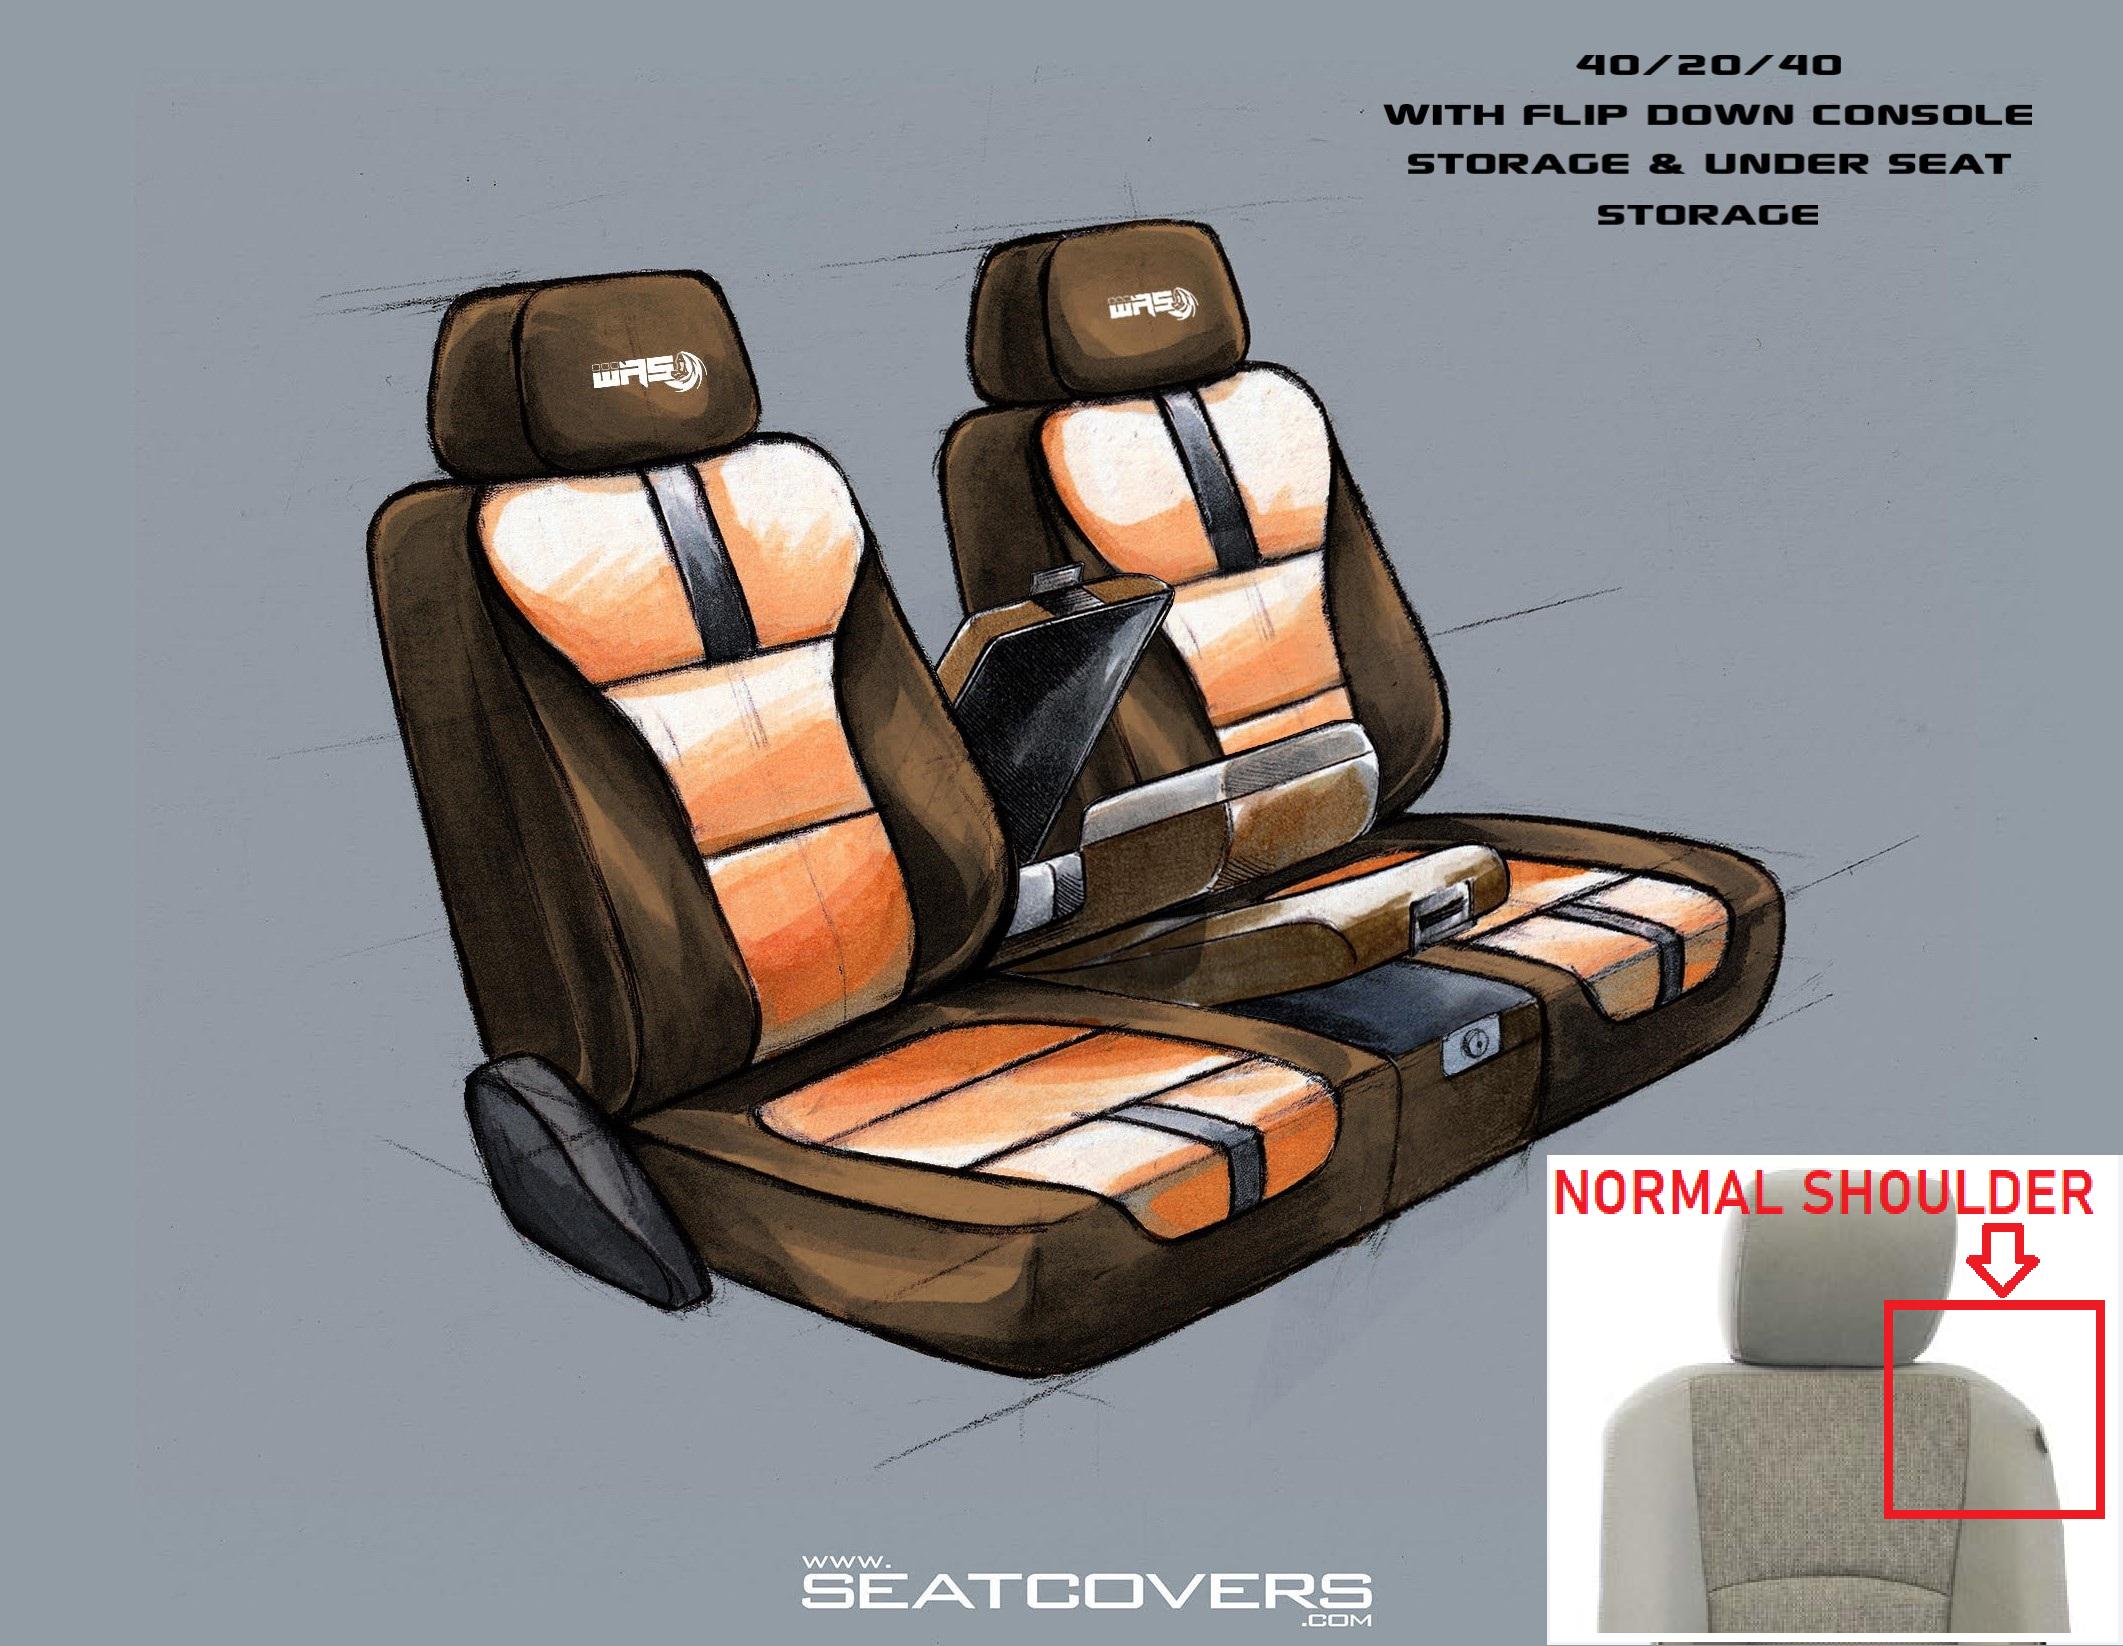 40.20.40 Top and bottome storage (Dodge NORMAL Shoulder) D424-09